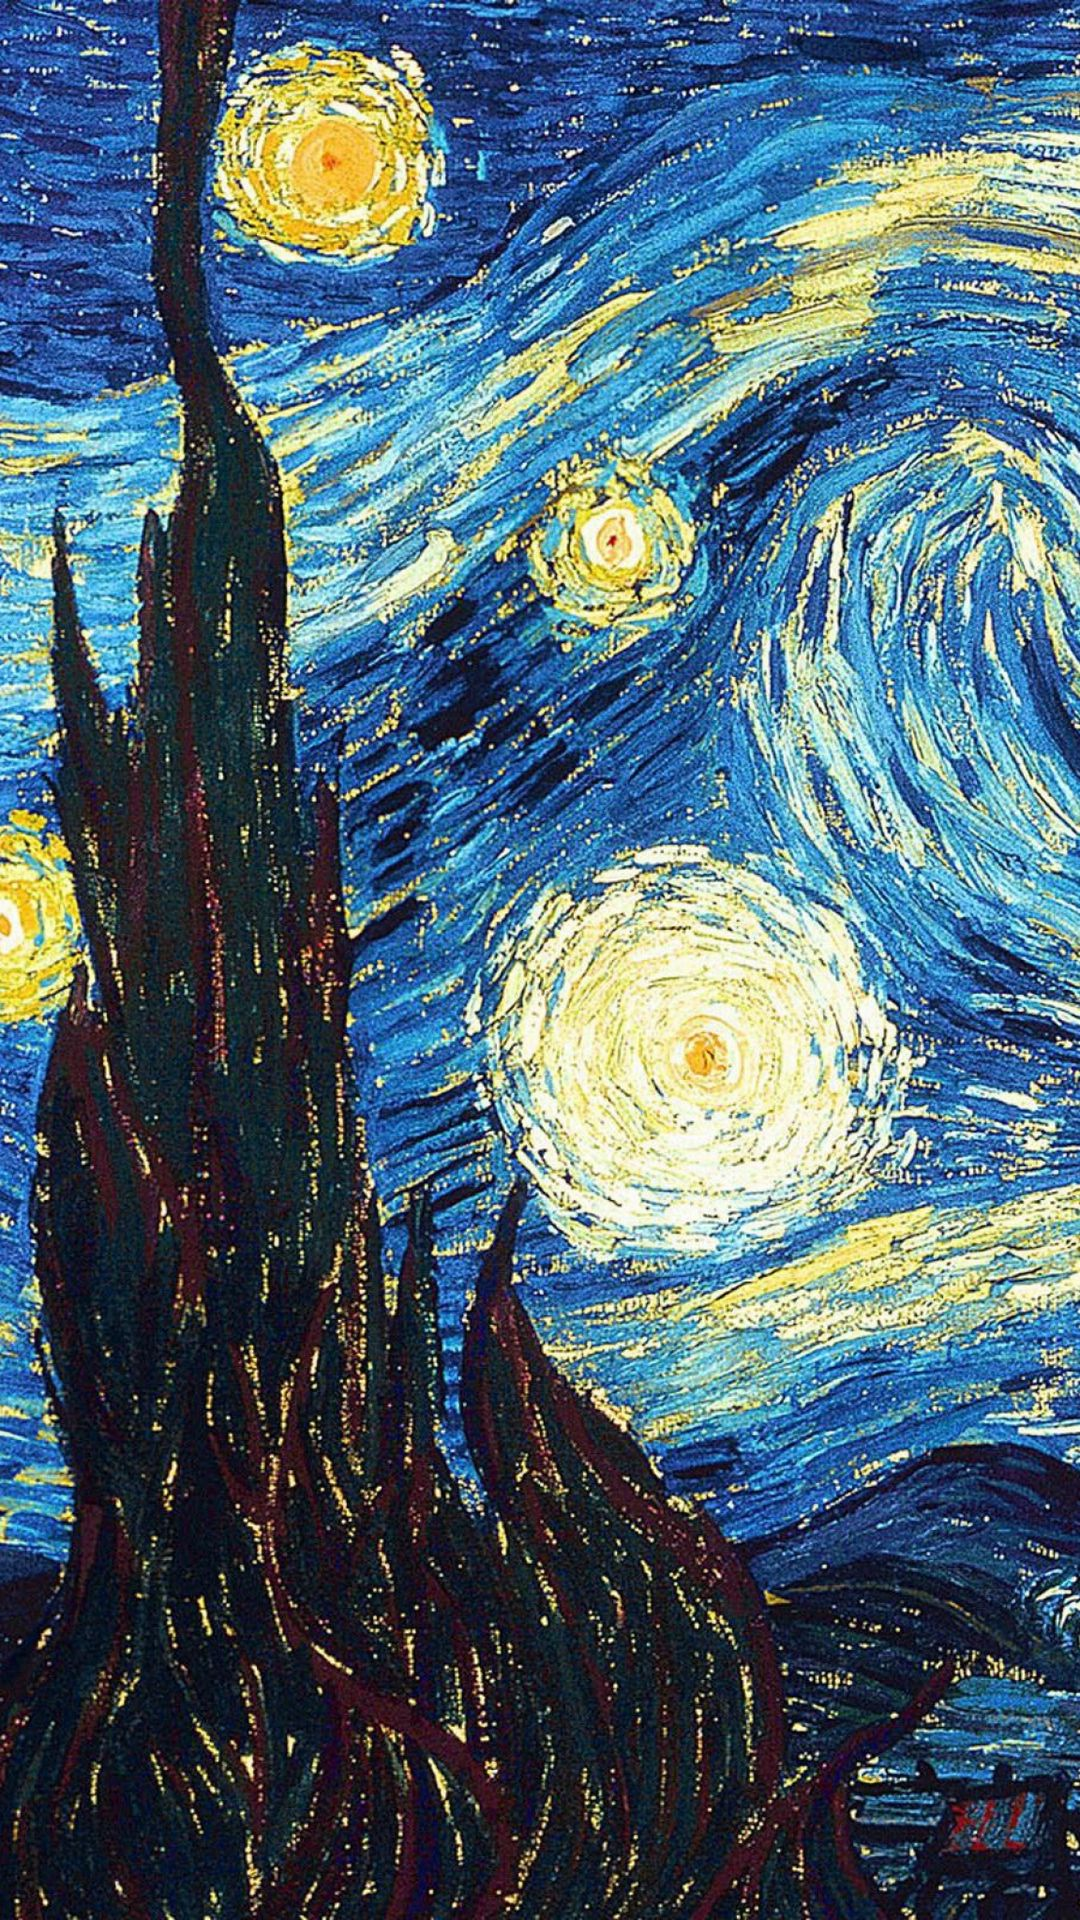 1080x1920 Wallpaper vincent van gogh, the starry night, oil, canvas